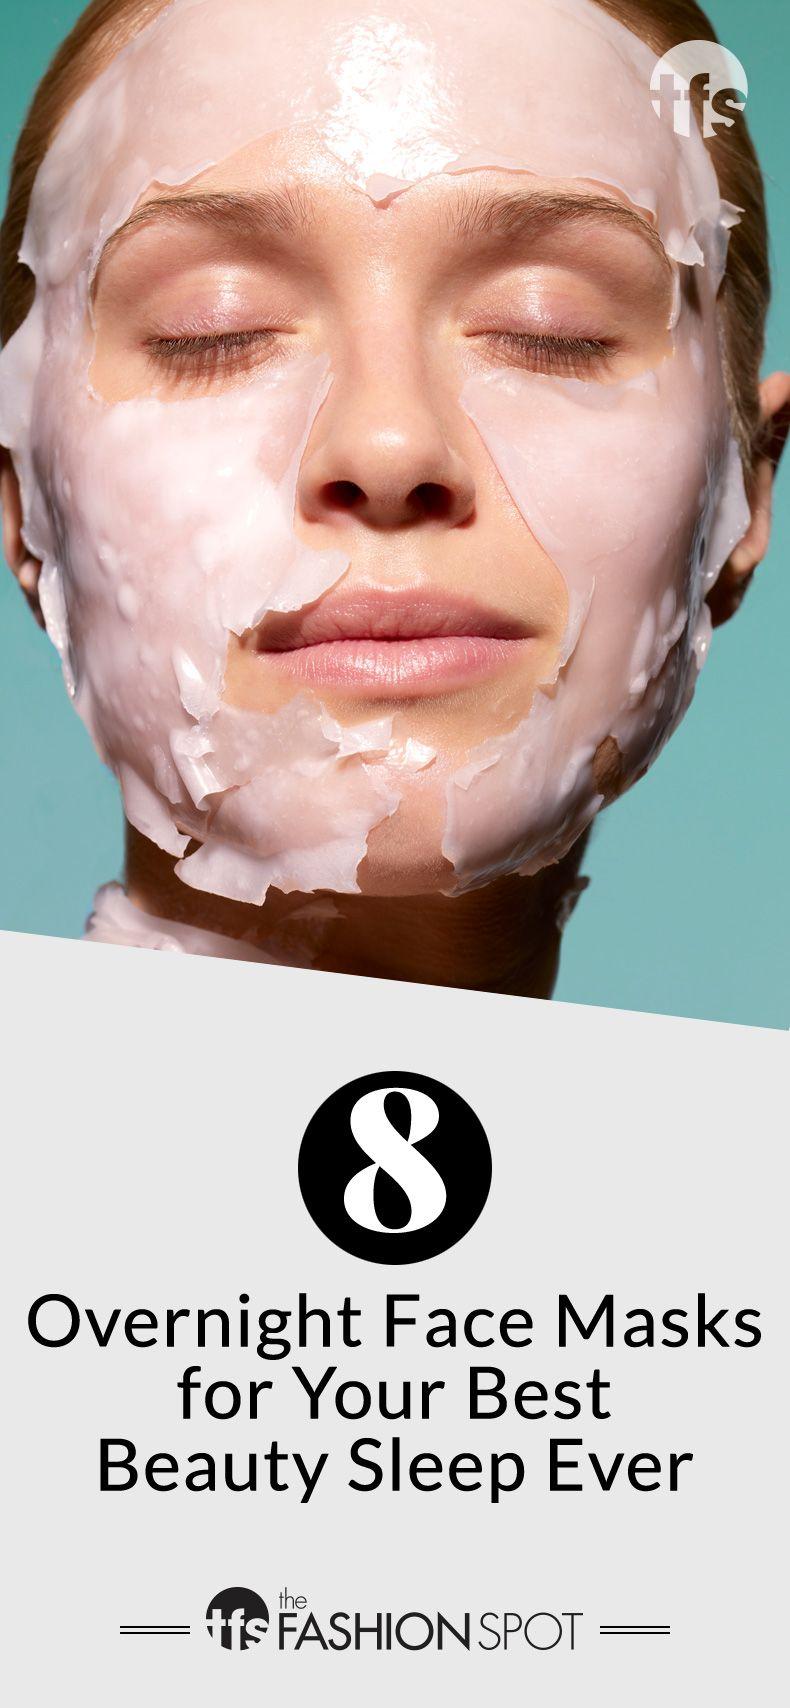 8 overnight face masks for the best beauty sleep ever | // beauty